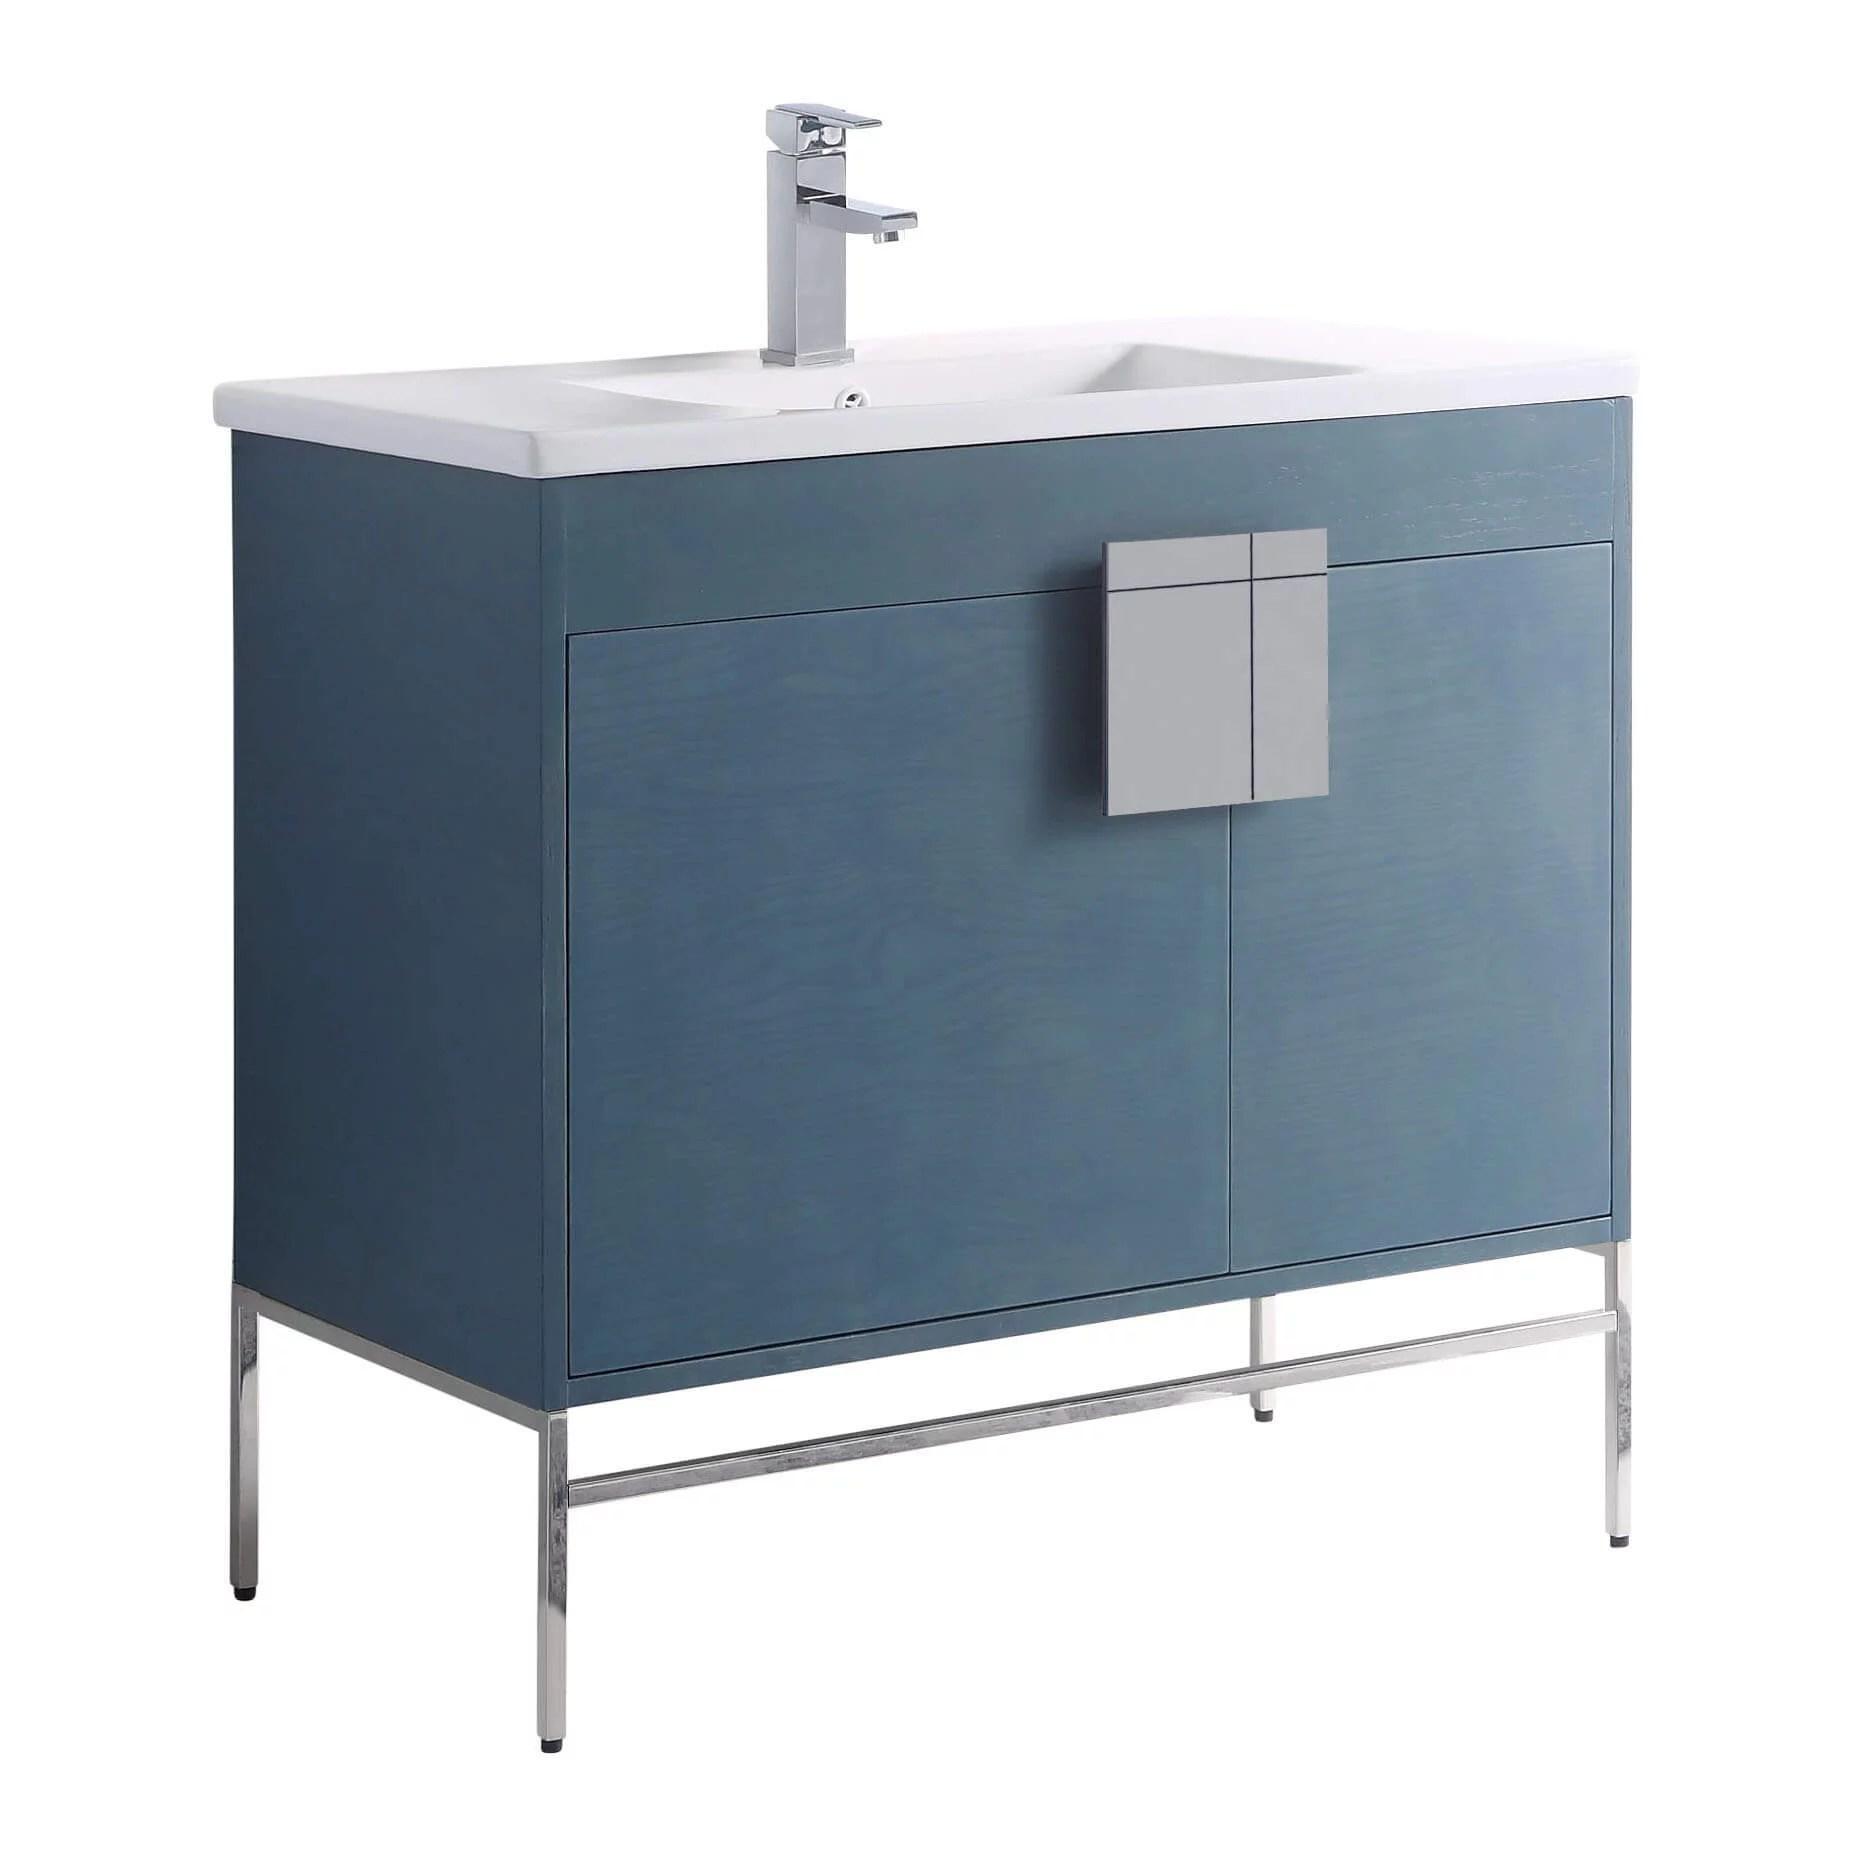 fine fixtures modern blue 36 bathroom vanity set chrome hardware vitreous china sink top walmart com